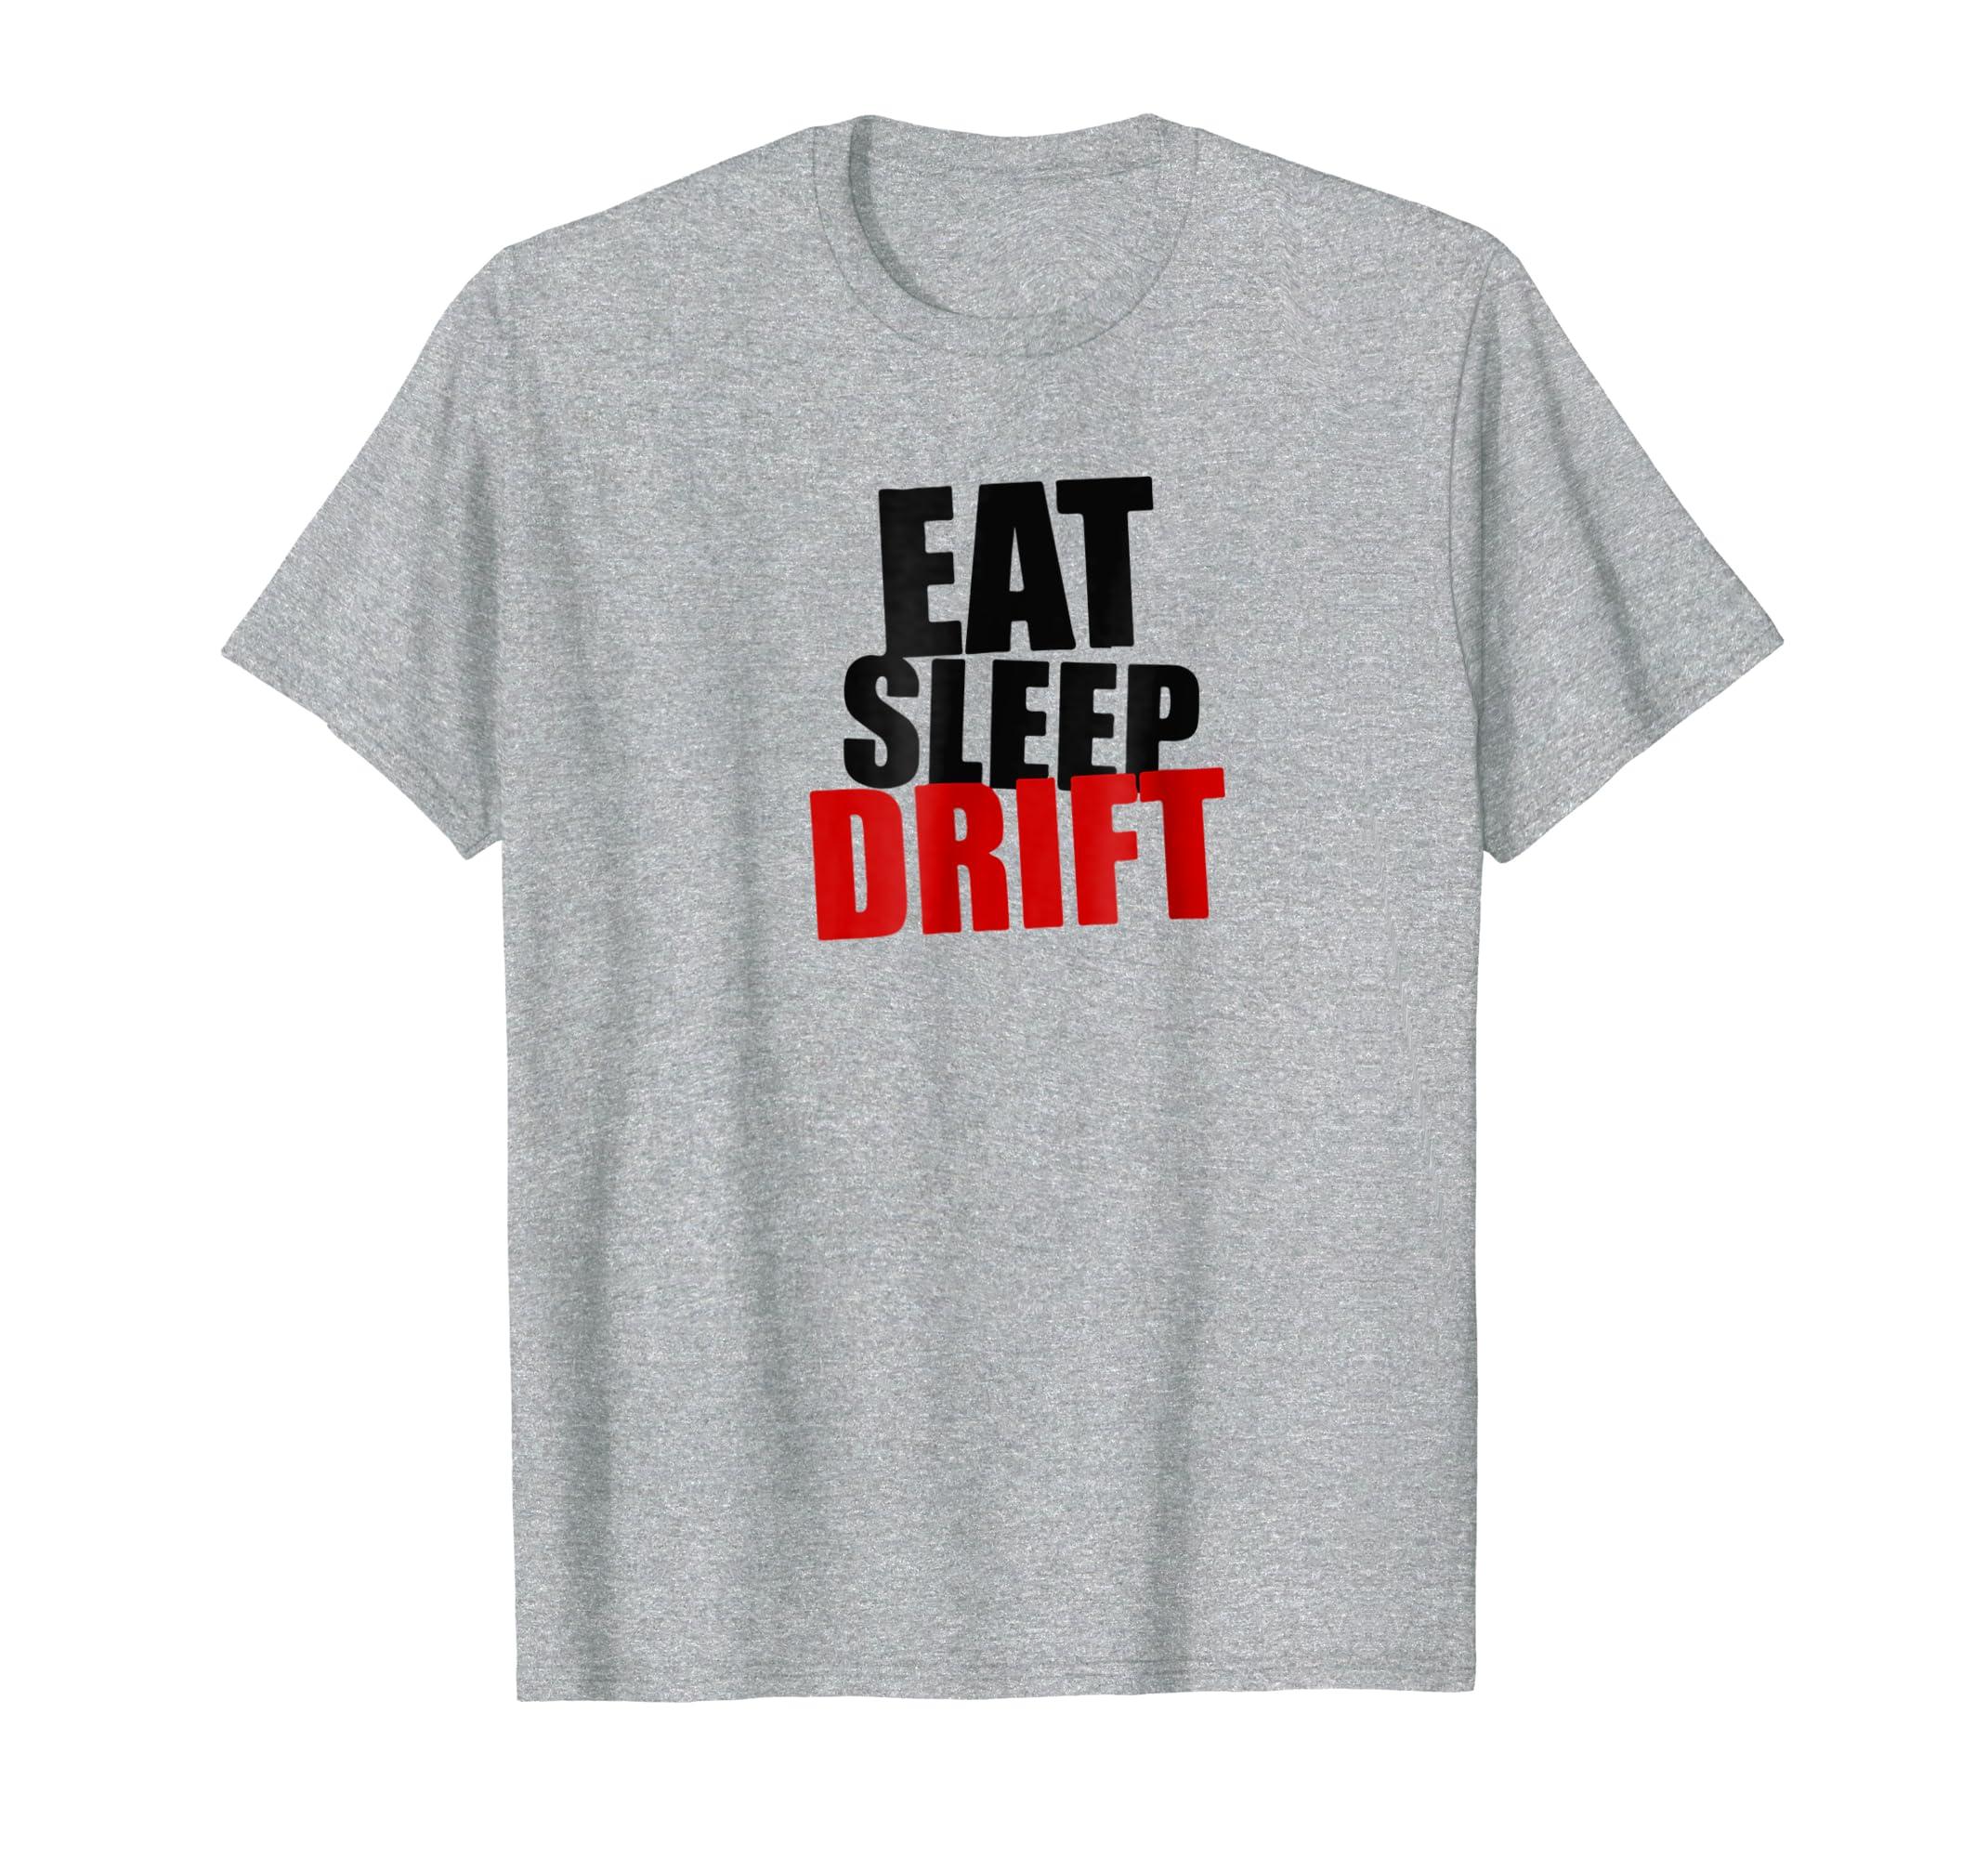 Amazon.com: Eat Sleep Drift Funny Classic Tshirts Car Turbo Shirts: Clothing